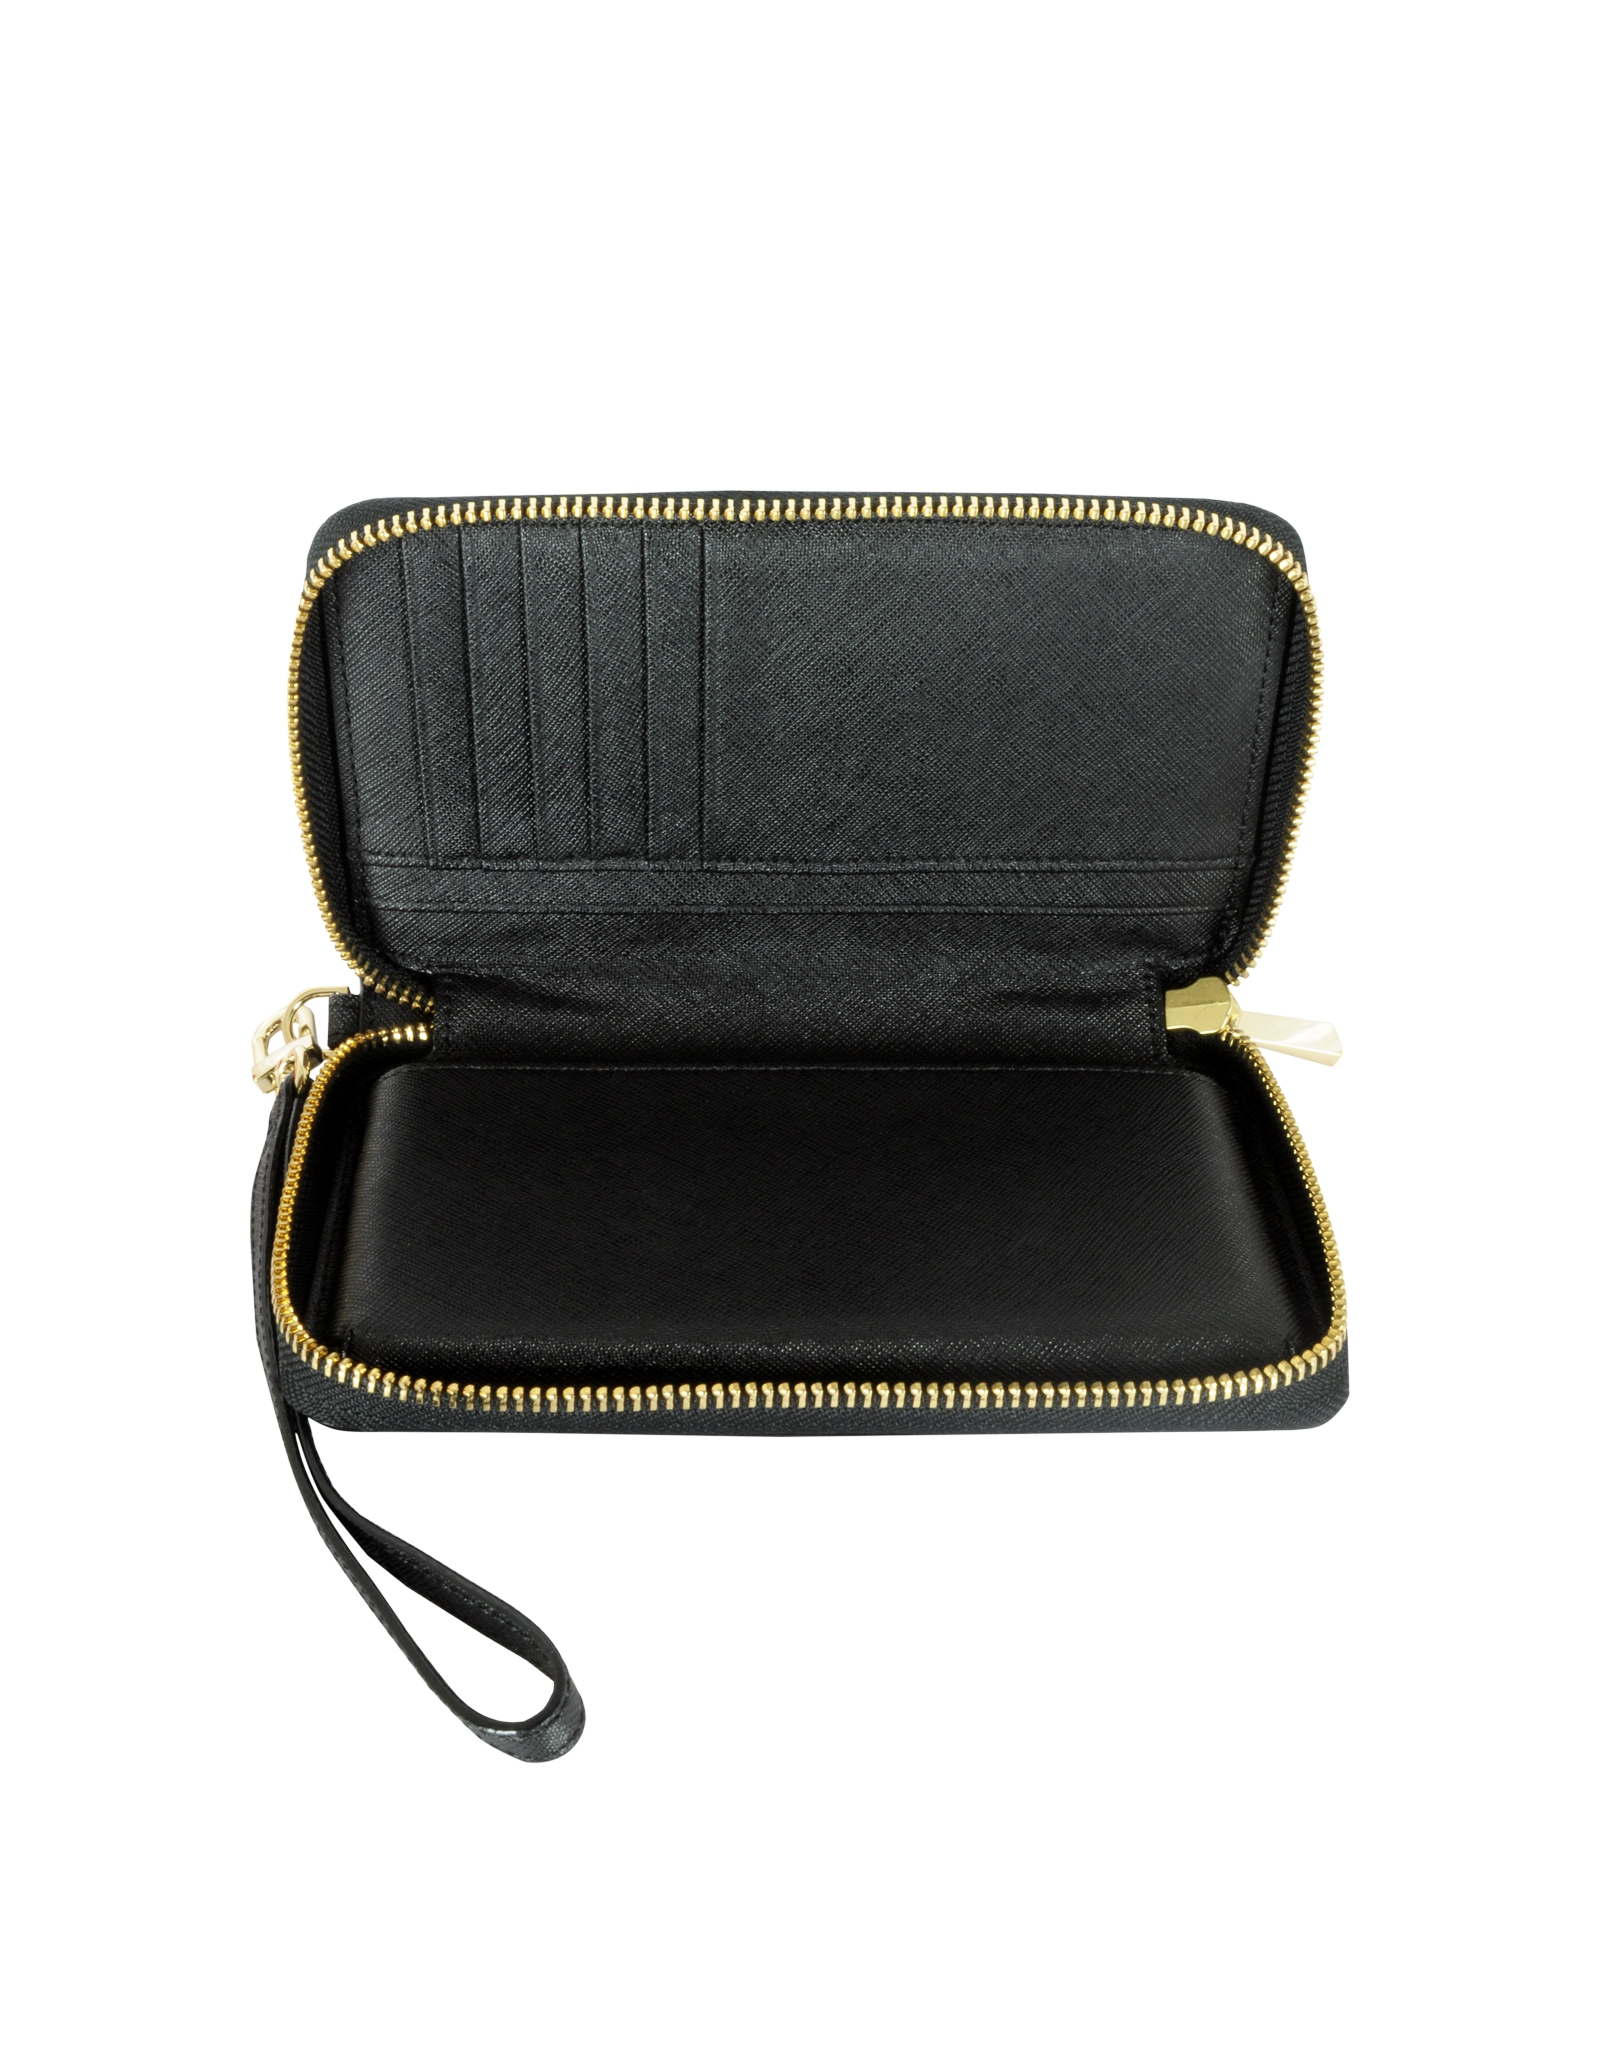 366c22d3d47 Tory Burch Robinson Zip-around Smartphone Wristlet in Black - Lyst